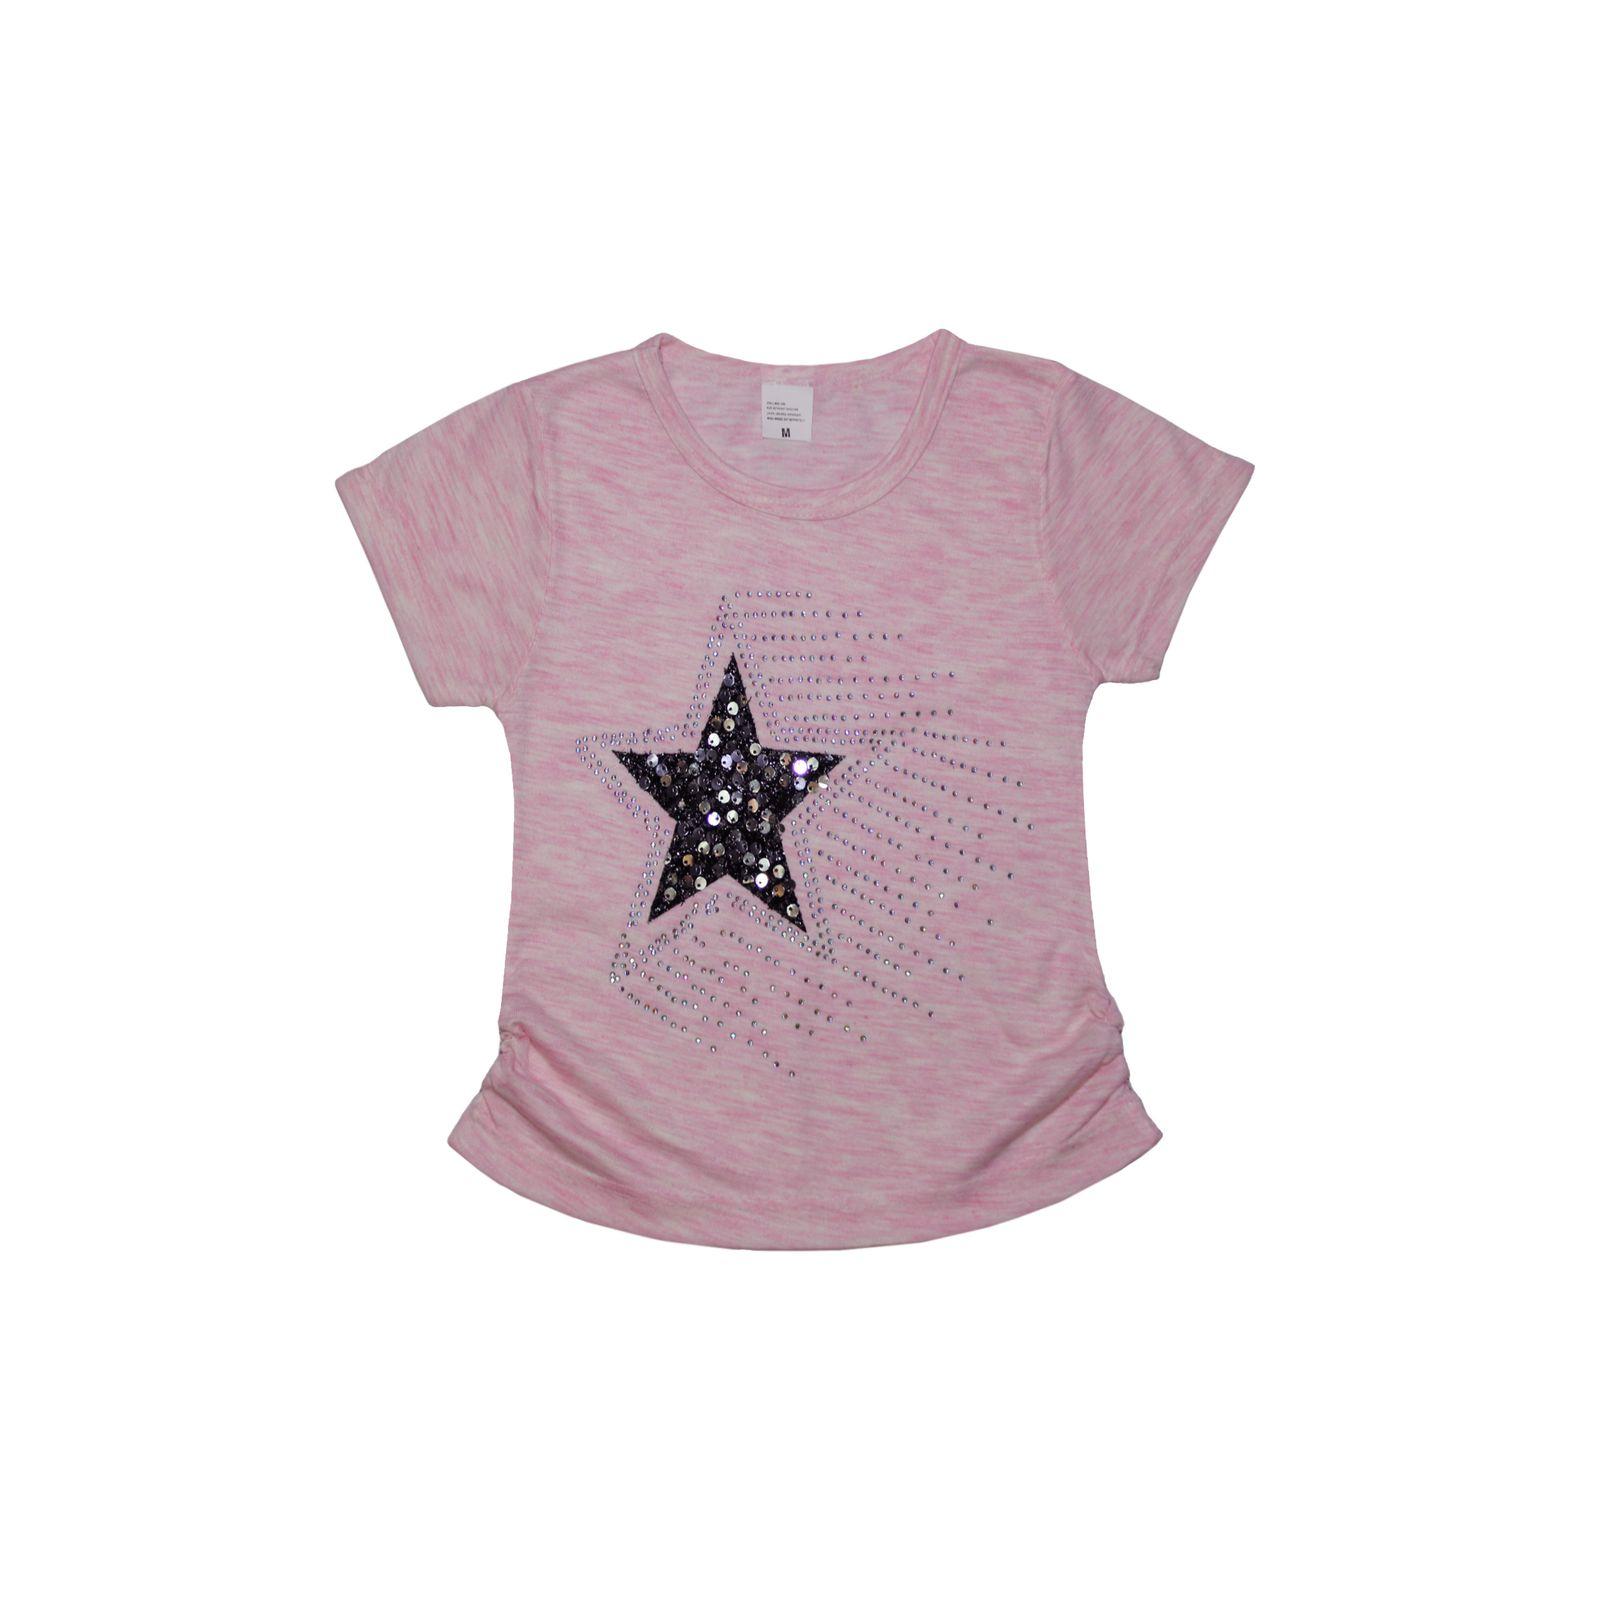 ست تیشرت و شلوارک دخترانه طرح ستاره کد ۱۳۶۲ -  - 4